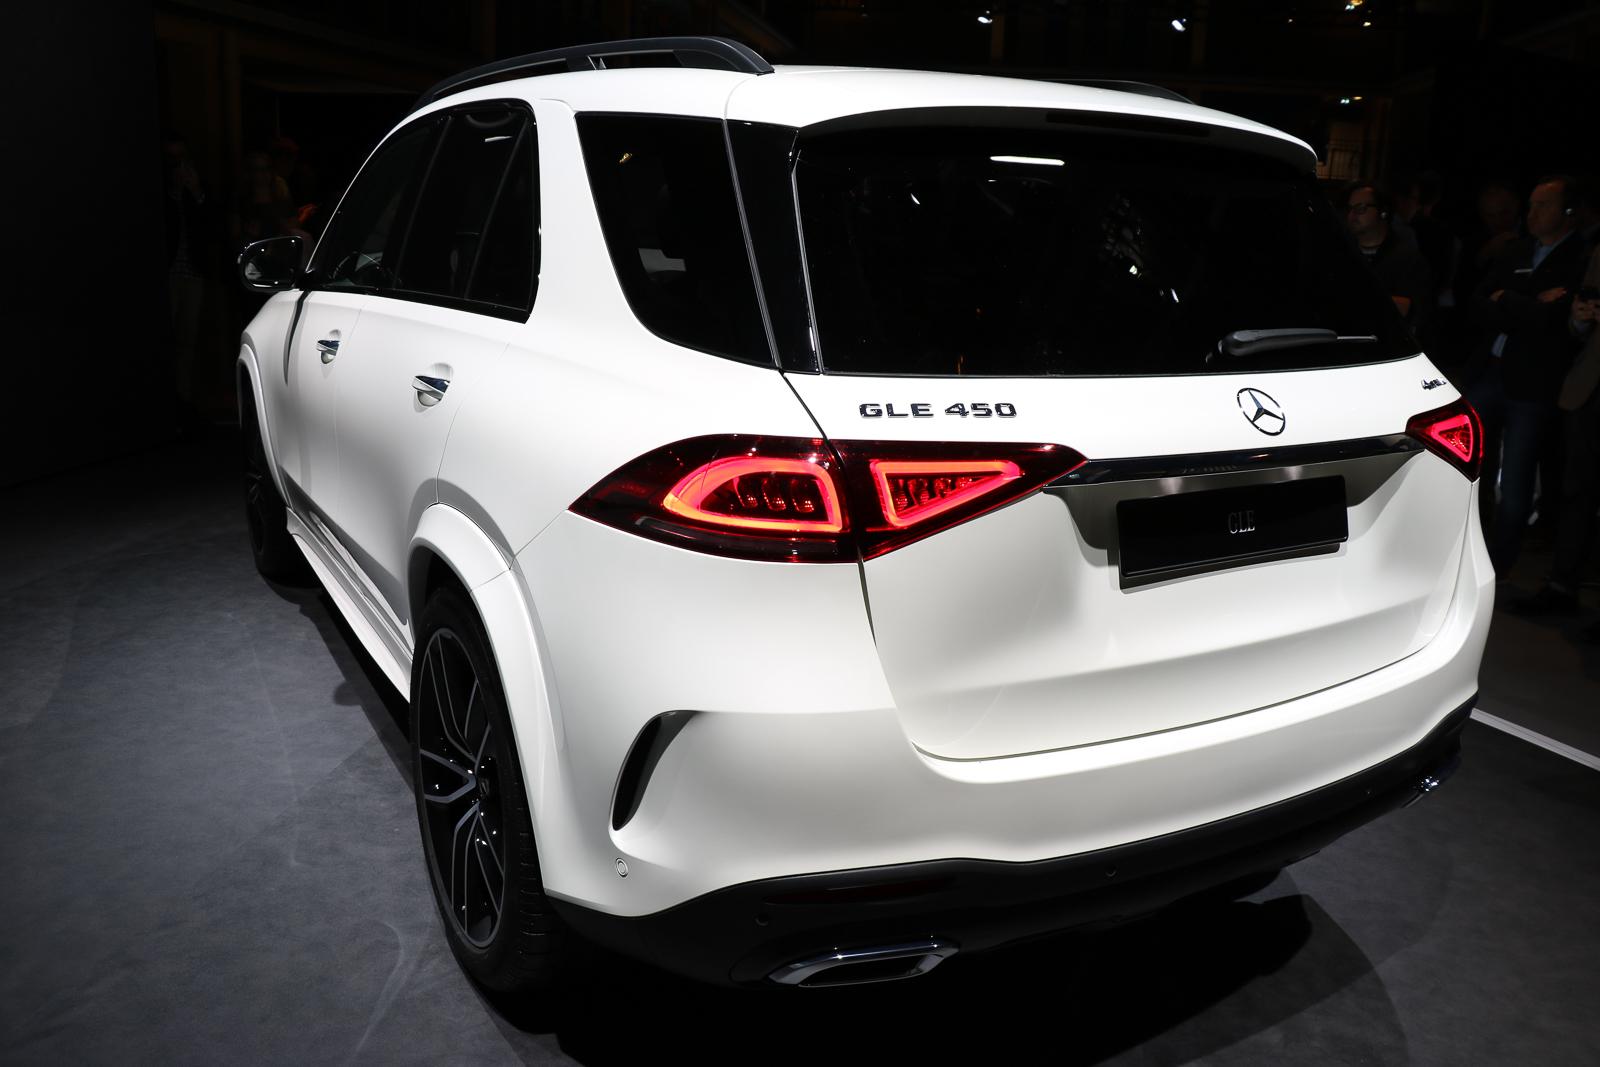 2019 mercedes-benz gle - sitzprobe im neuen mercedes gle 450! | rad